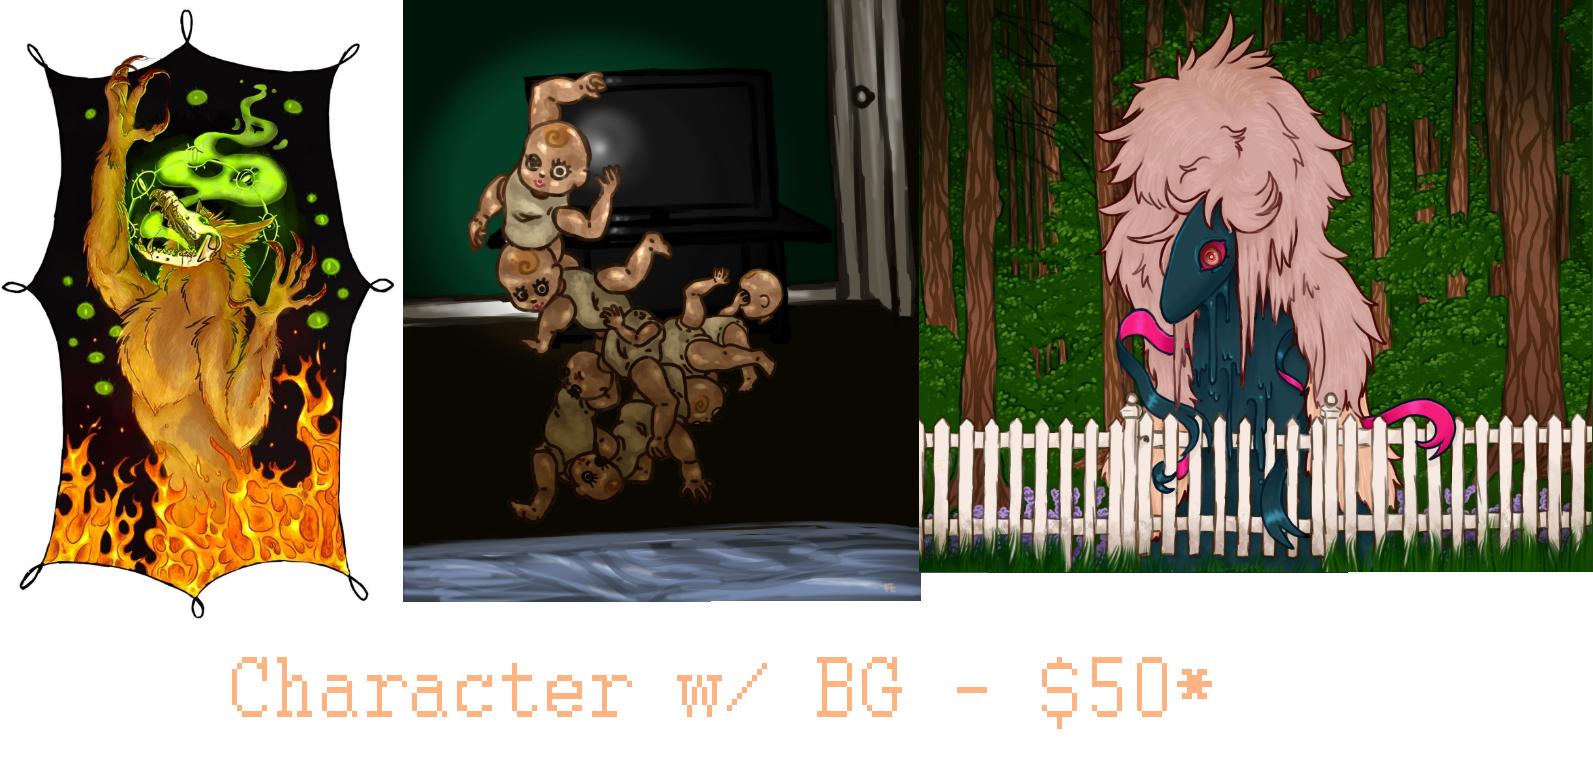 characterwbg.png